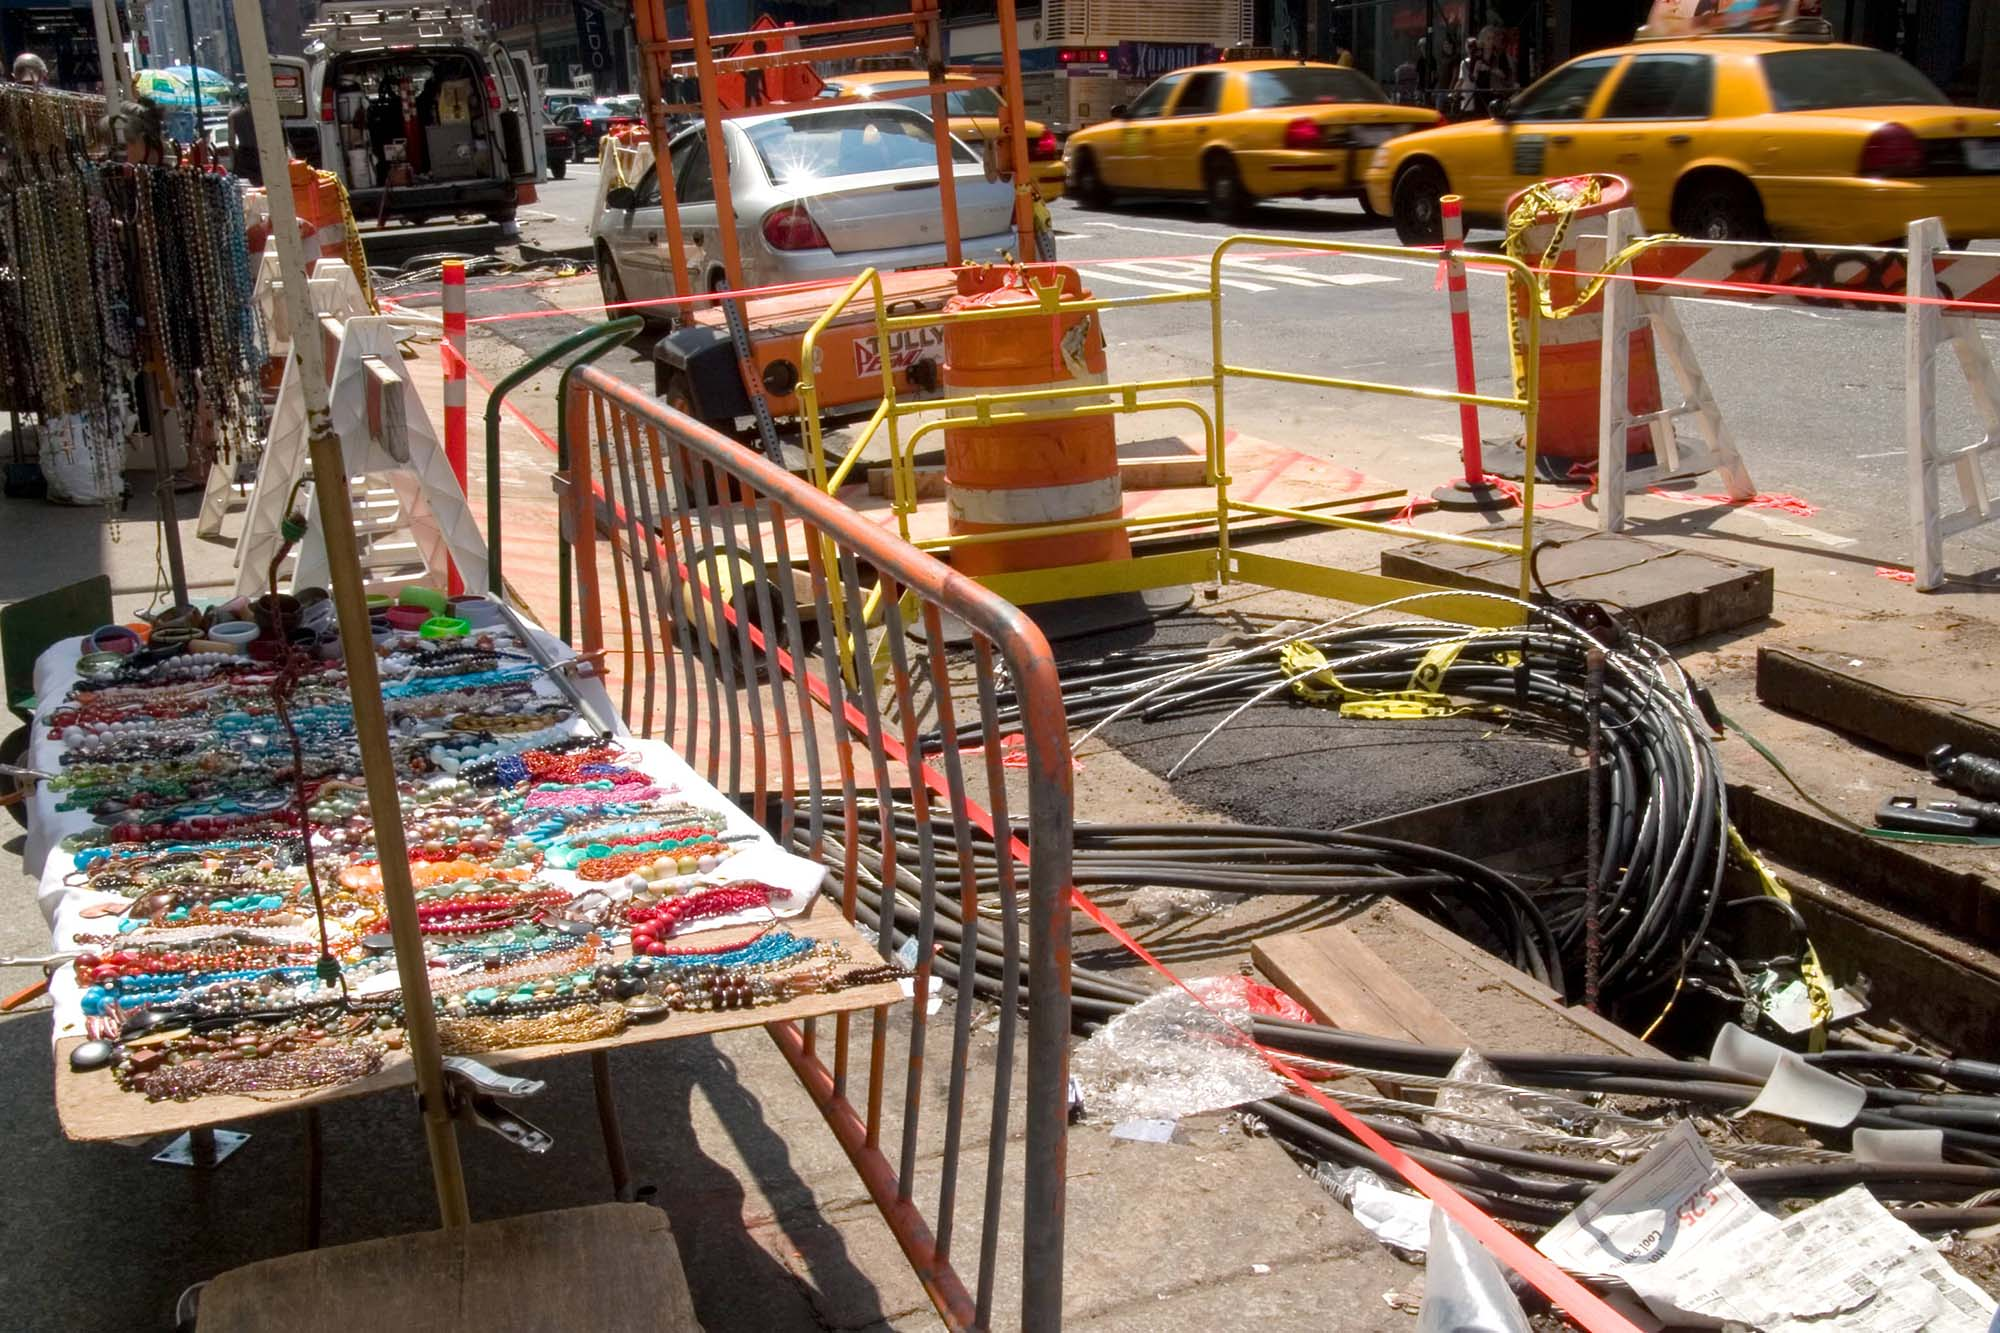 Construction on the sidewalk